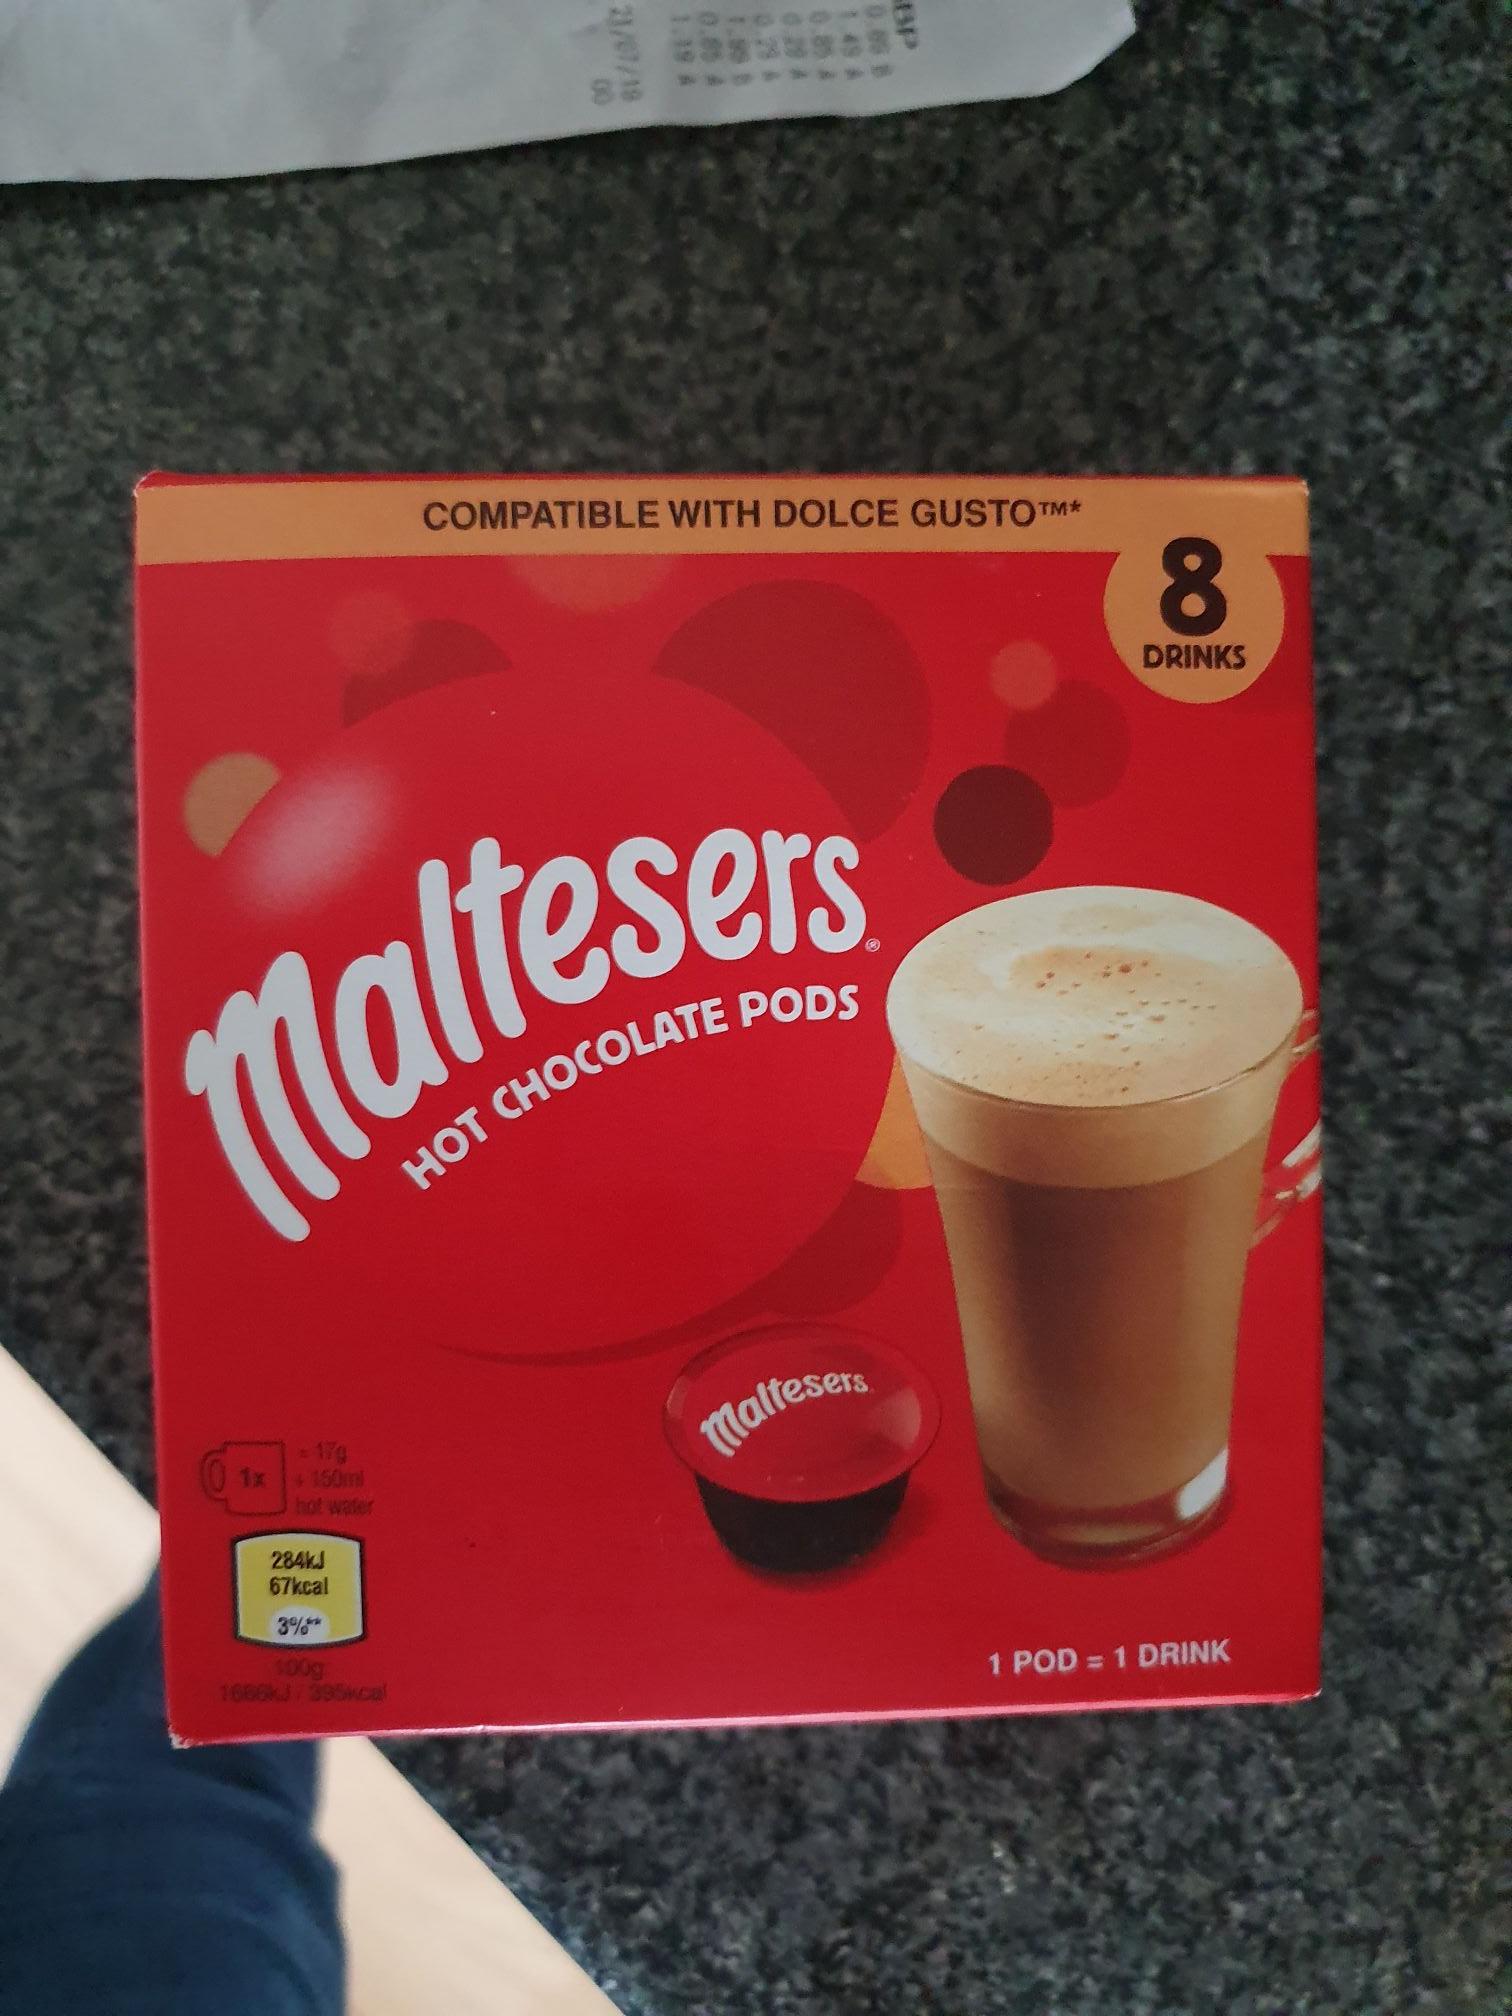 Half Price - Dolce Gusto Hot Chocolate - £1.49 at Aldi instore